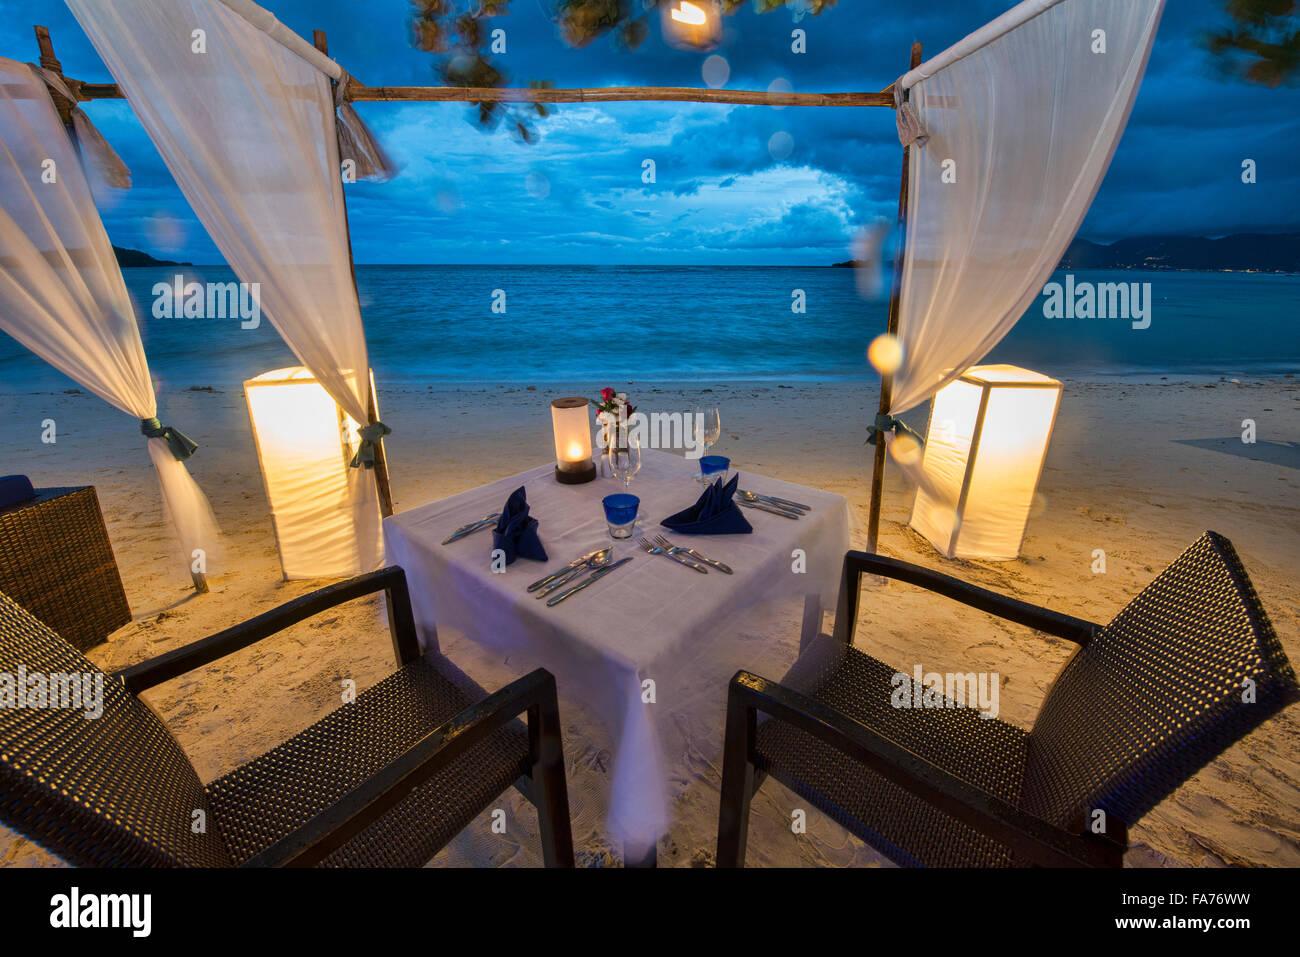 Romantic table by the sea on Koh Samui island, Thailand - Stock Image